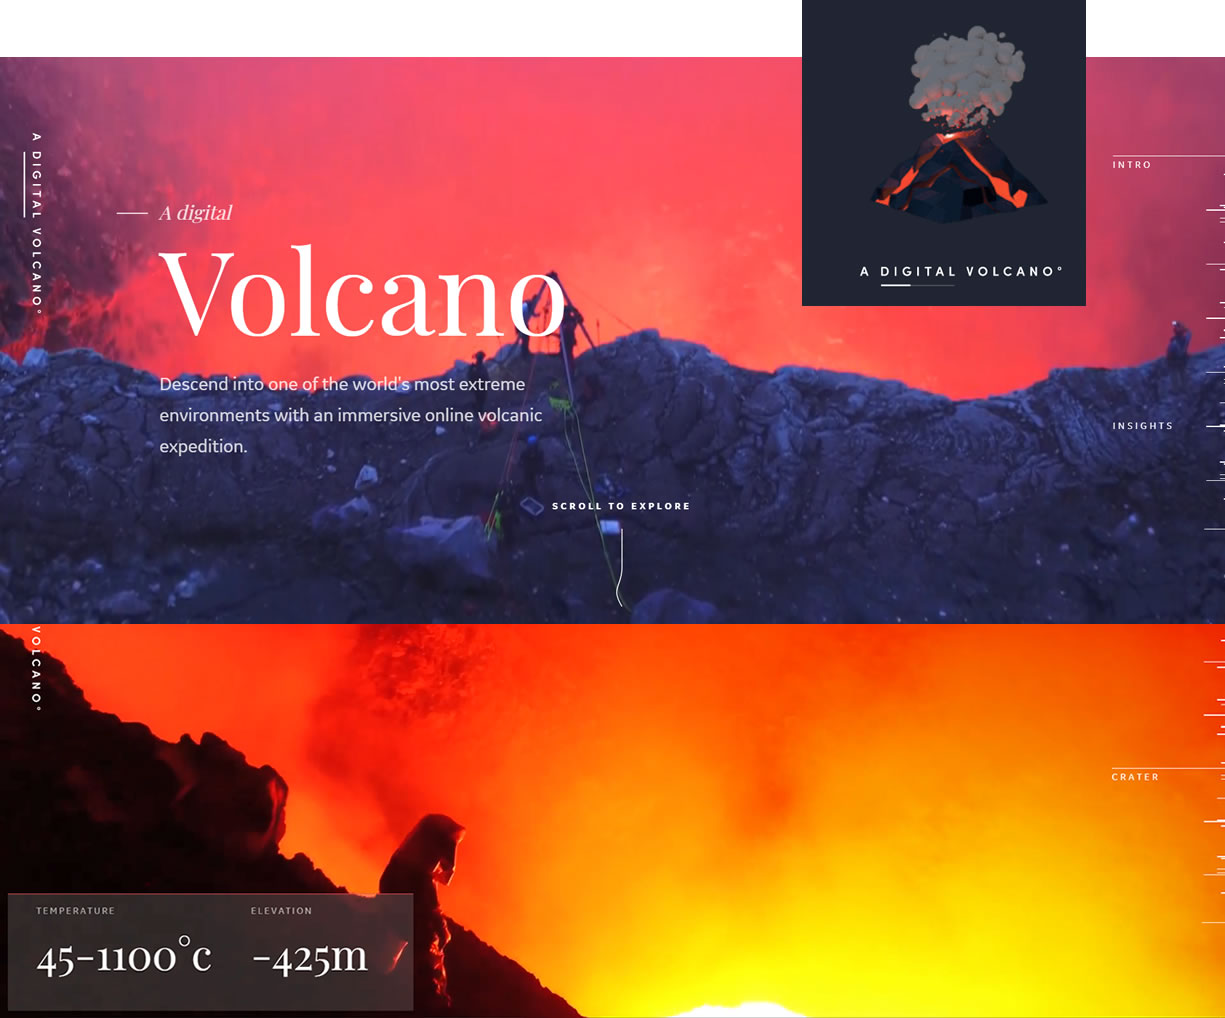 GE - Digital Volcano